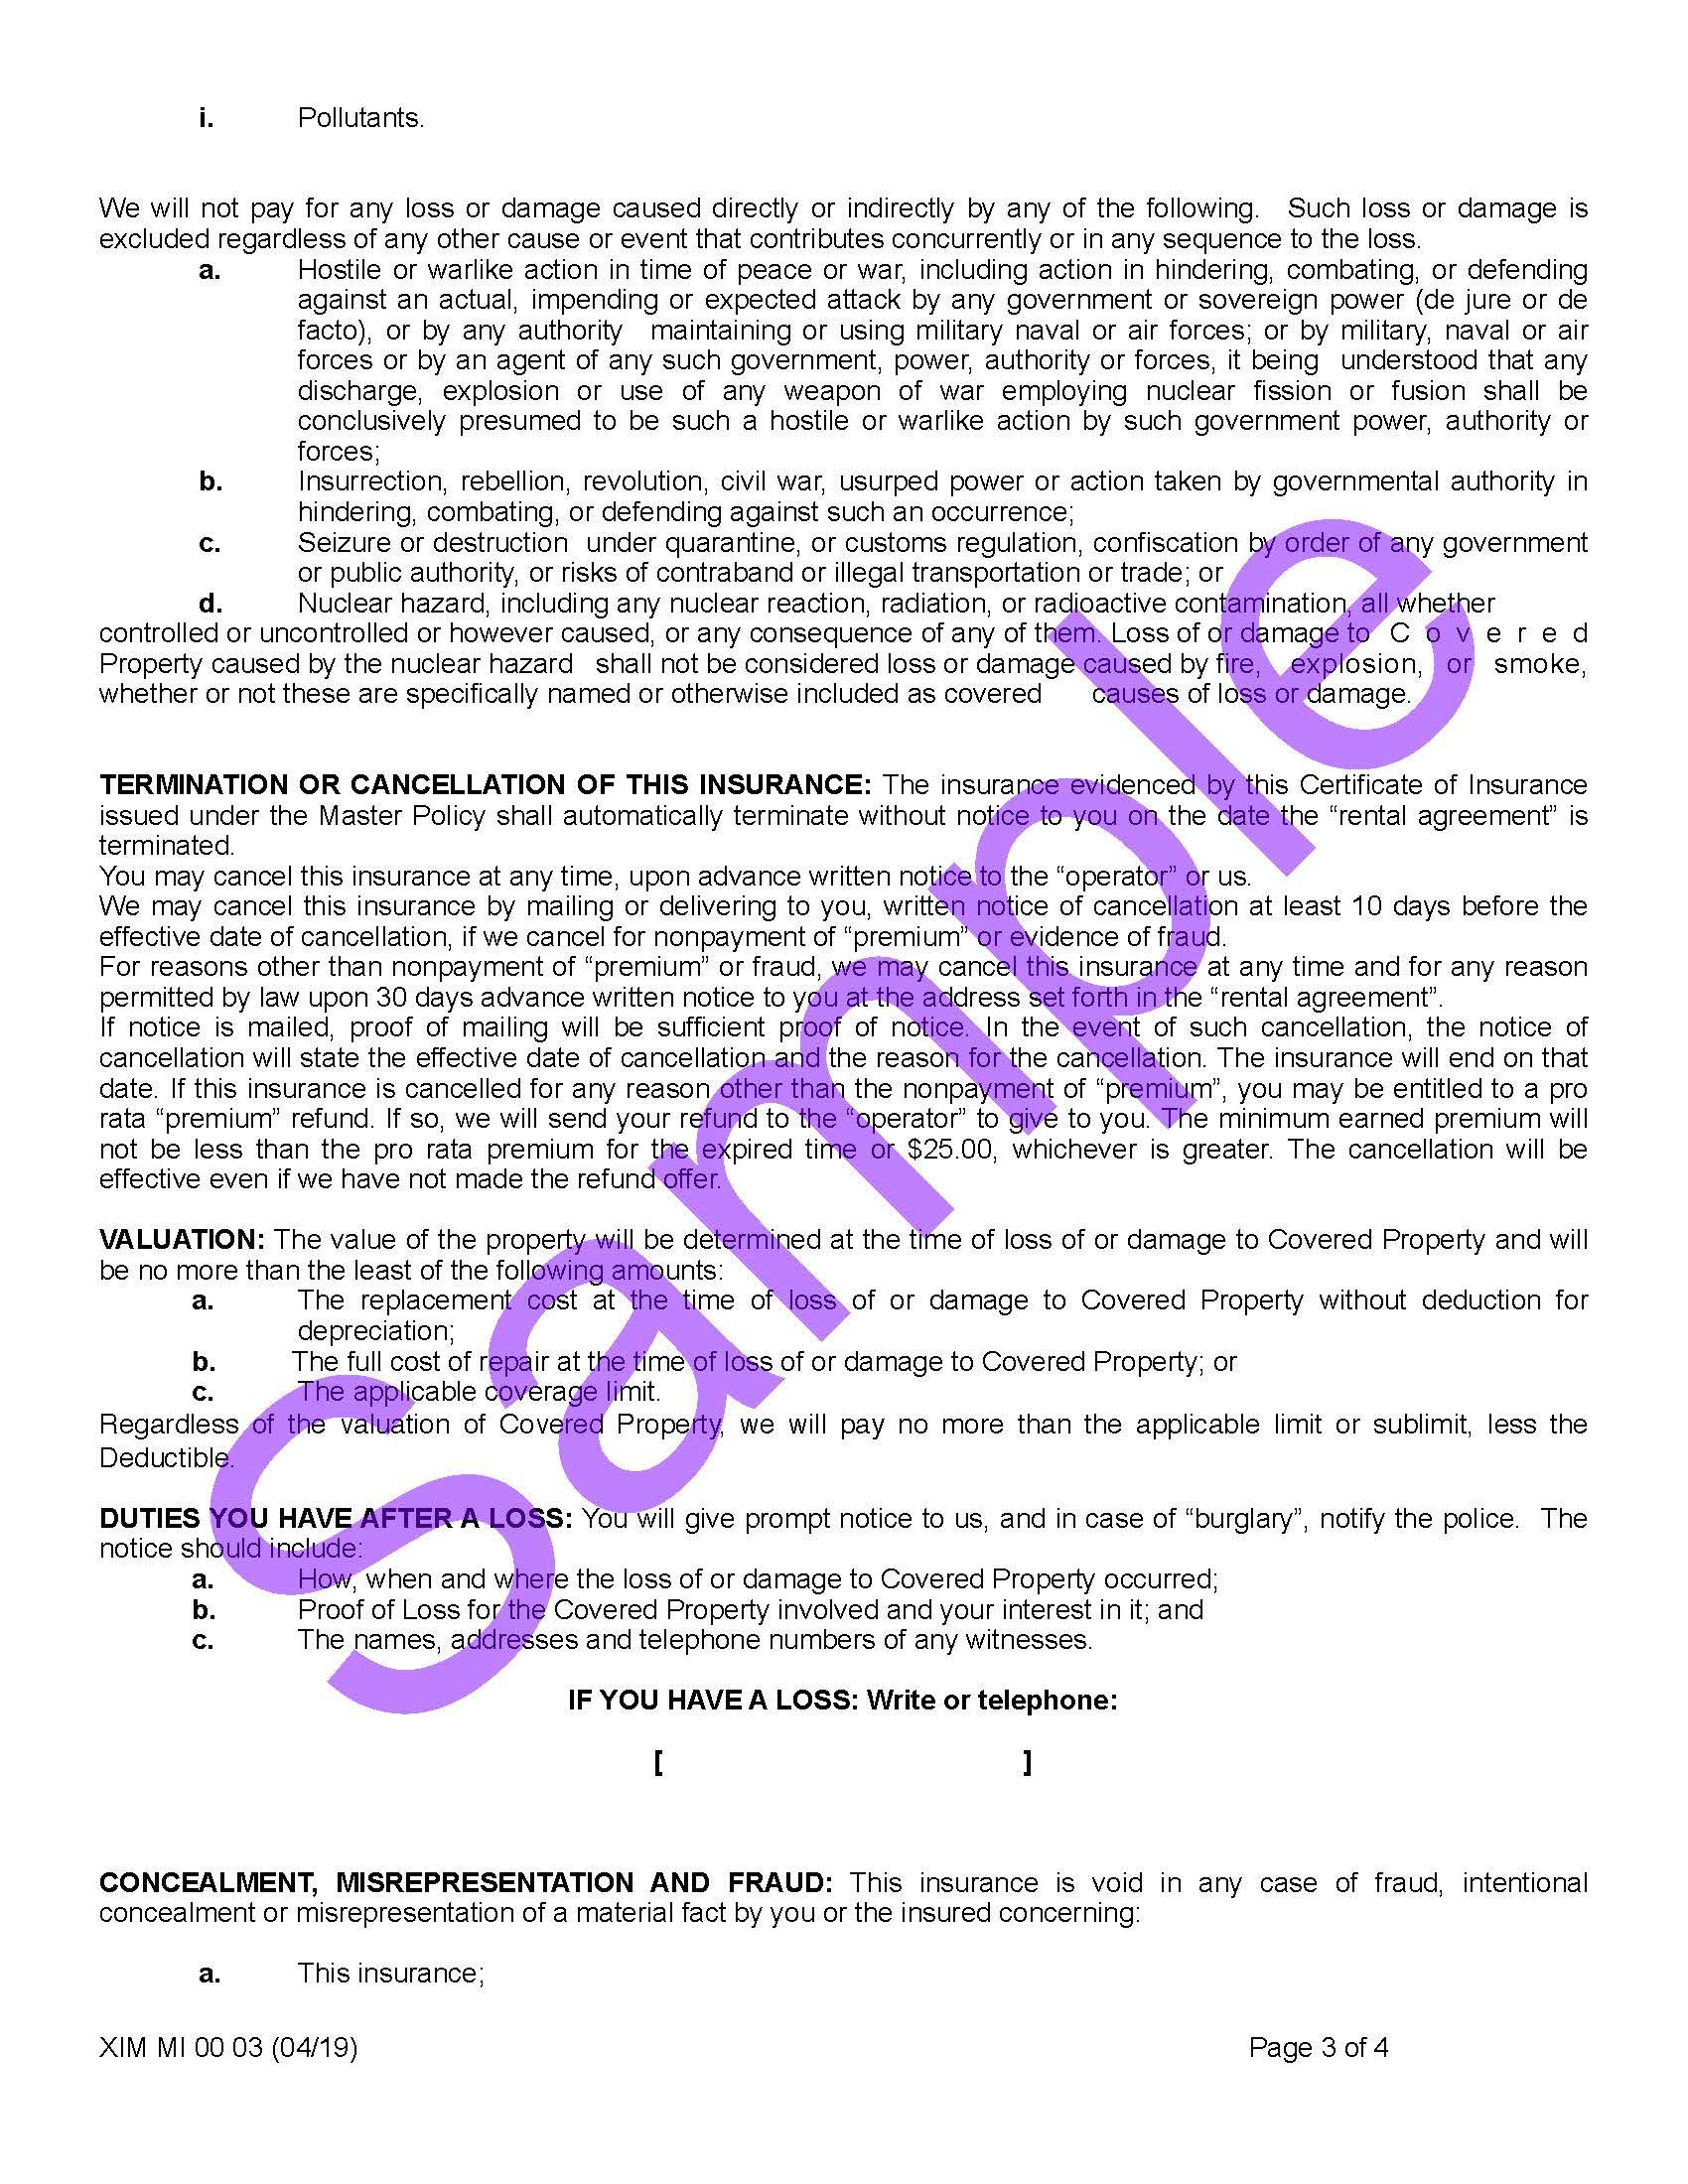 XIM MI 00 03 04 19 Michigan Certificate of InsuranceSample_Page_3.jpg